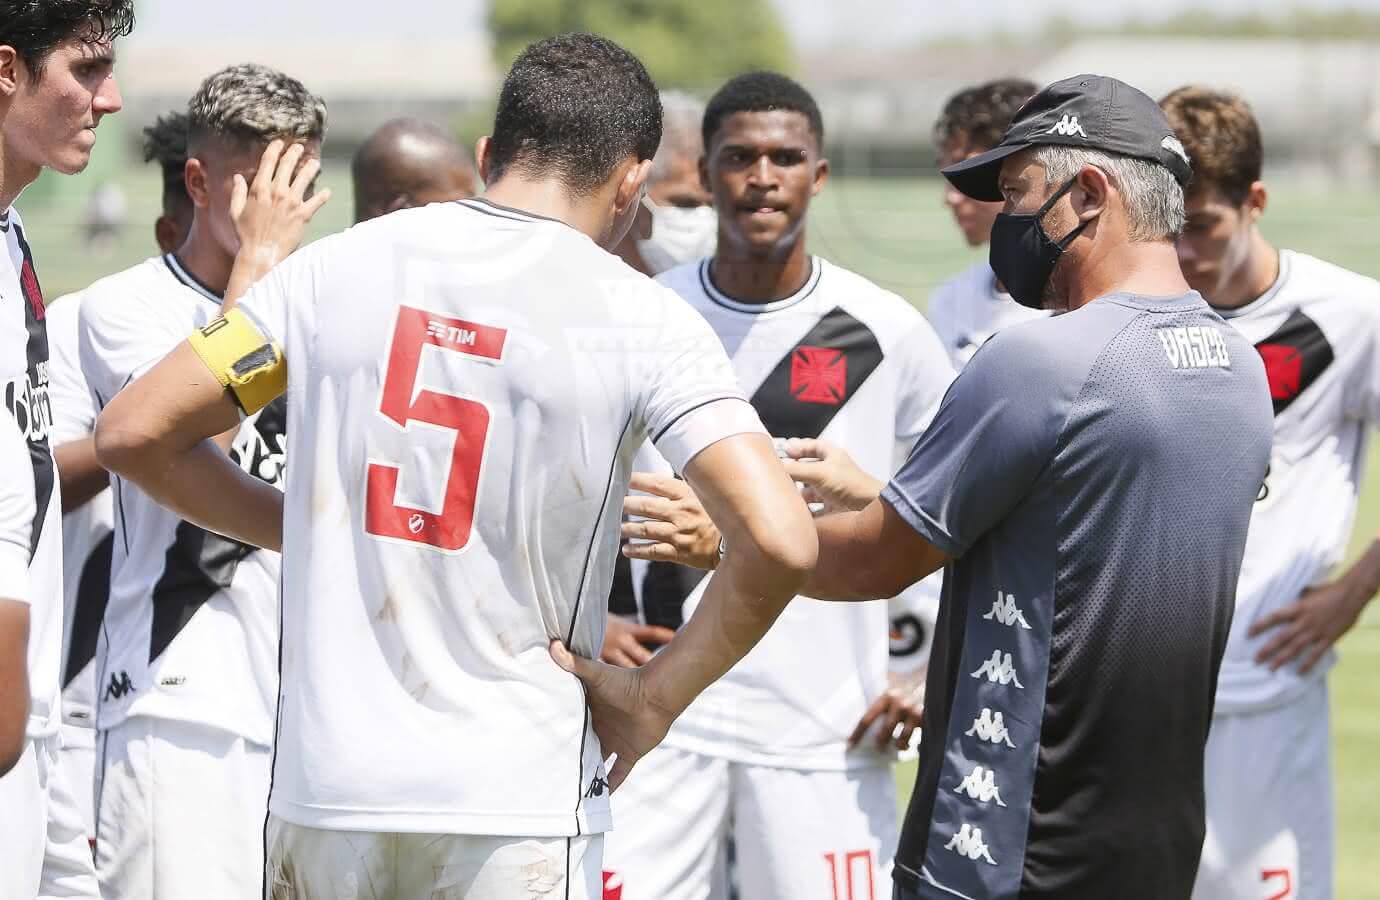 Grasseli orientando o time contra o Flamengo